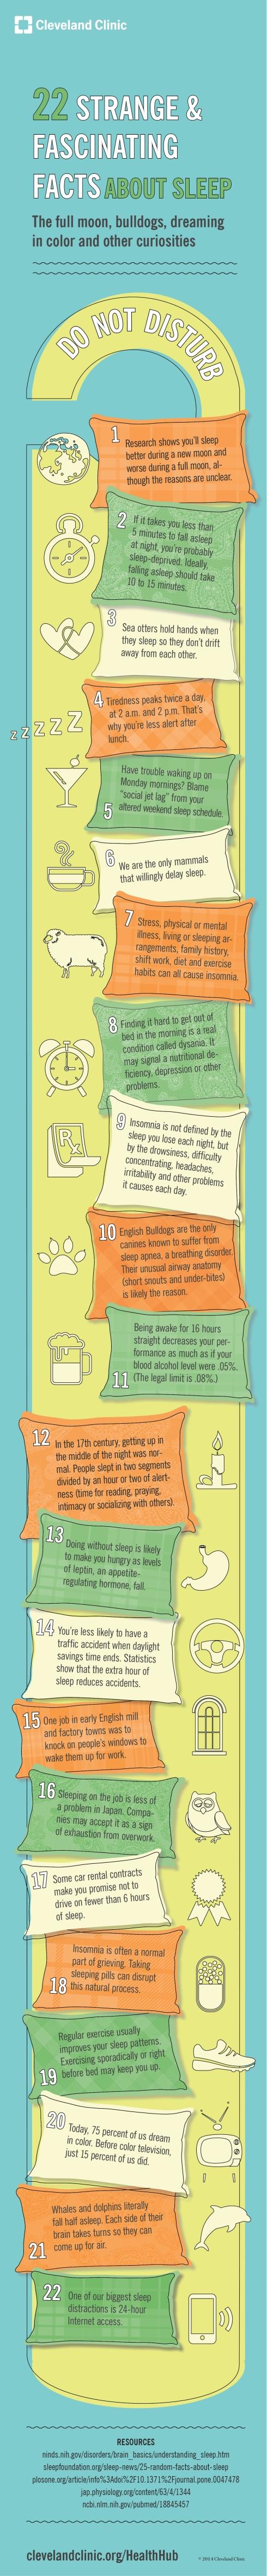 -Adult-Sleep-Infographic_05.02.2014_FINAL